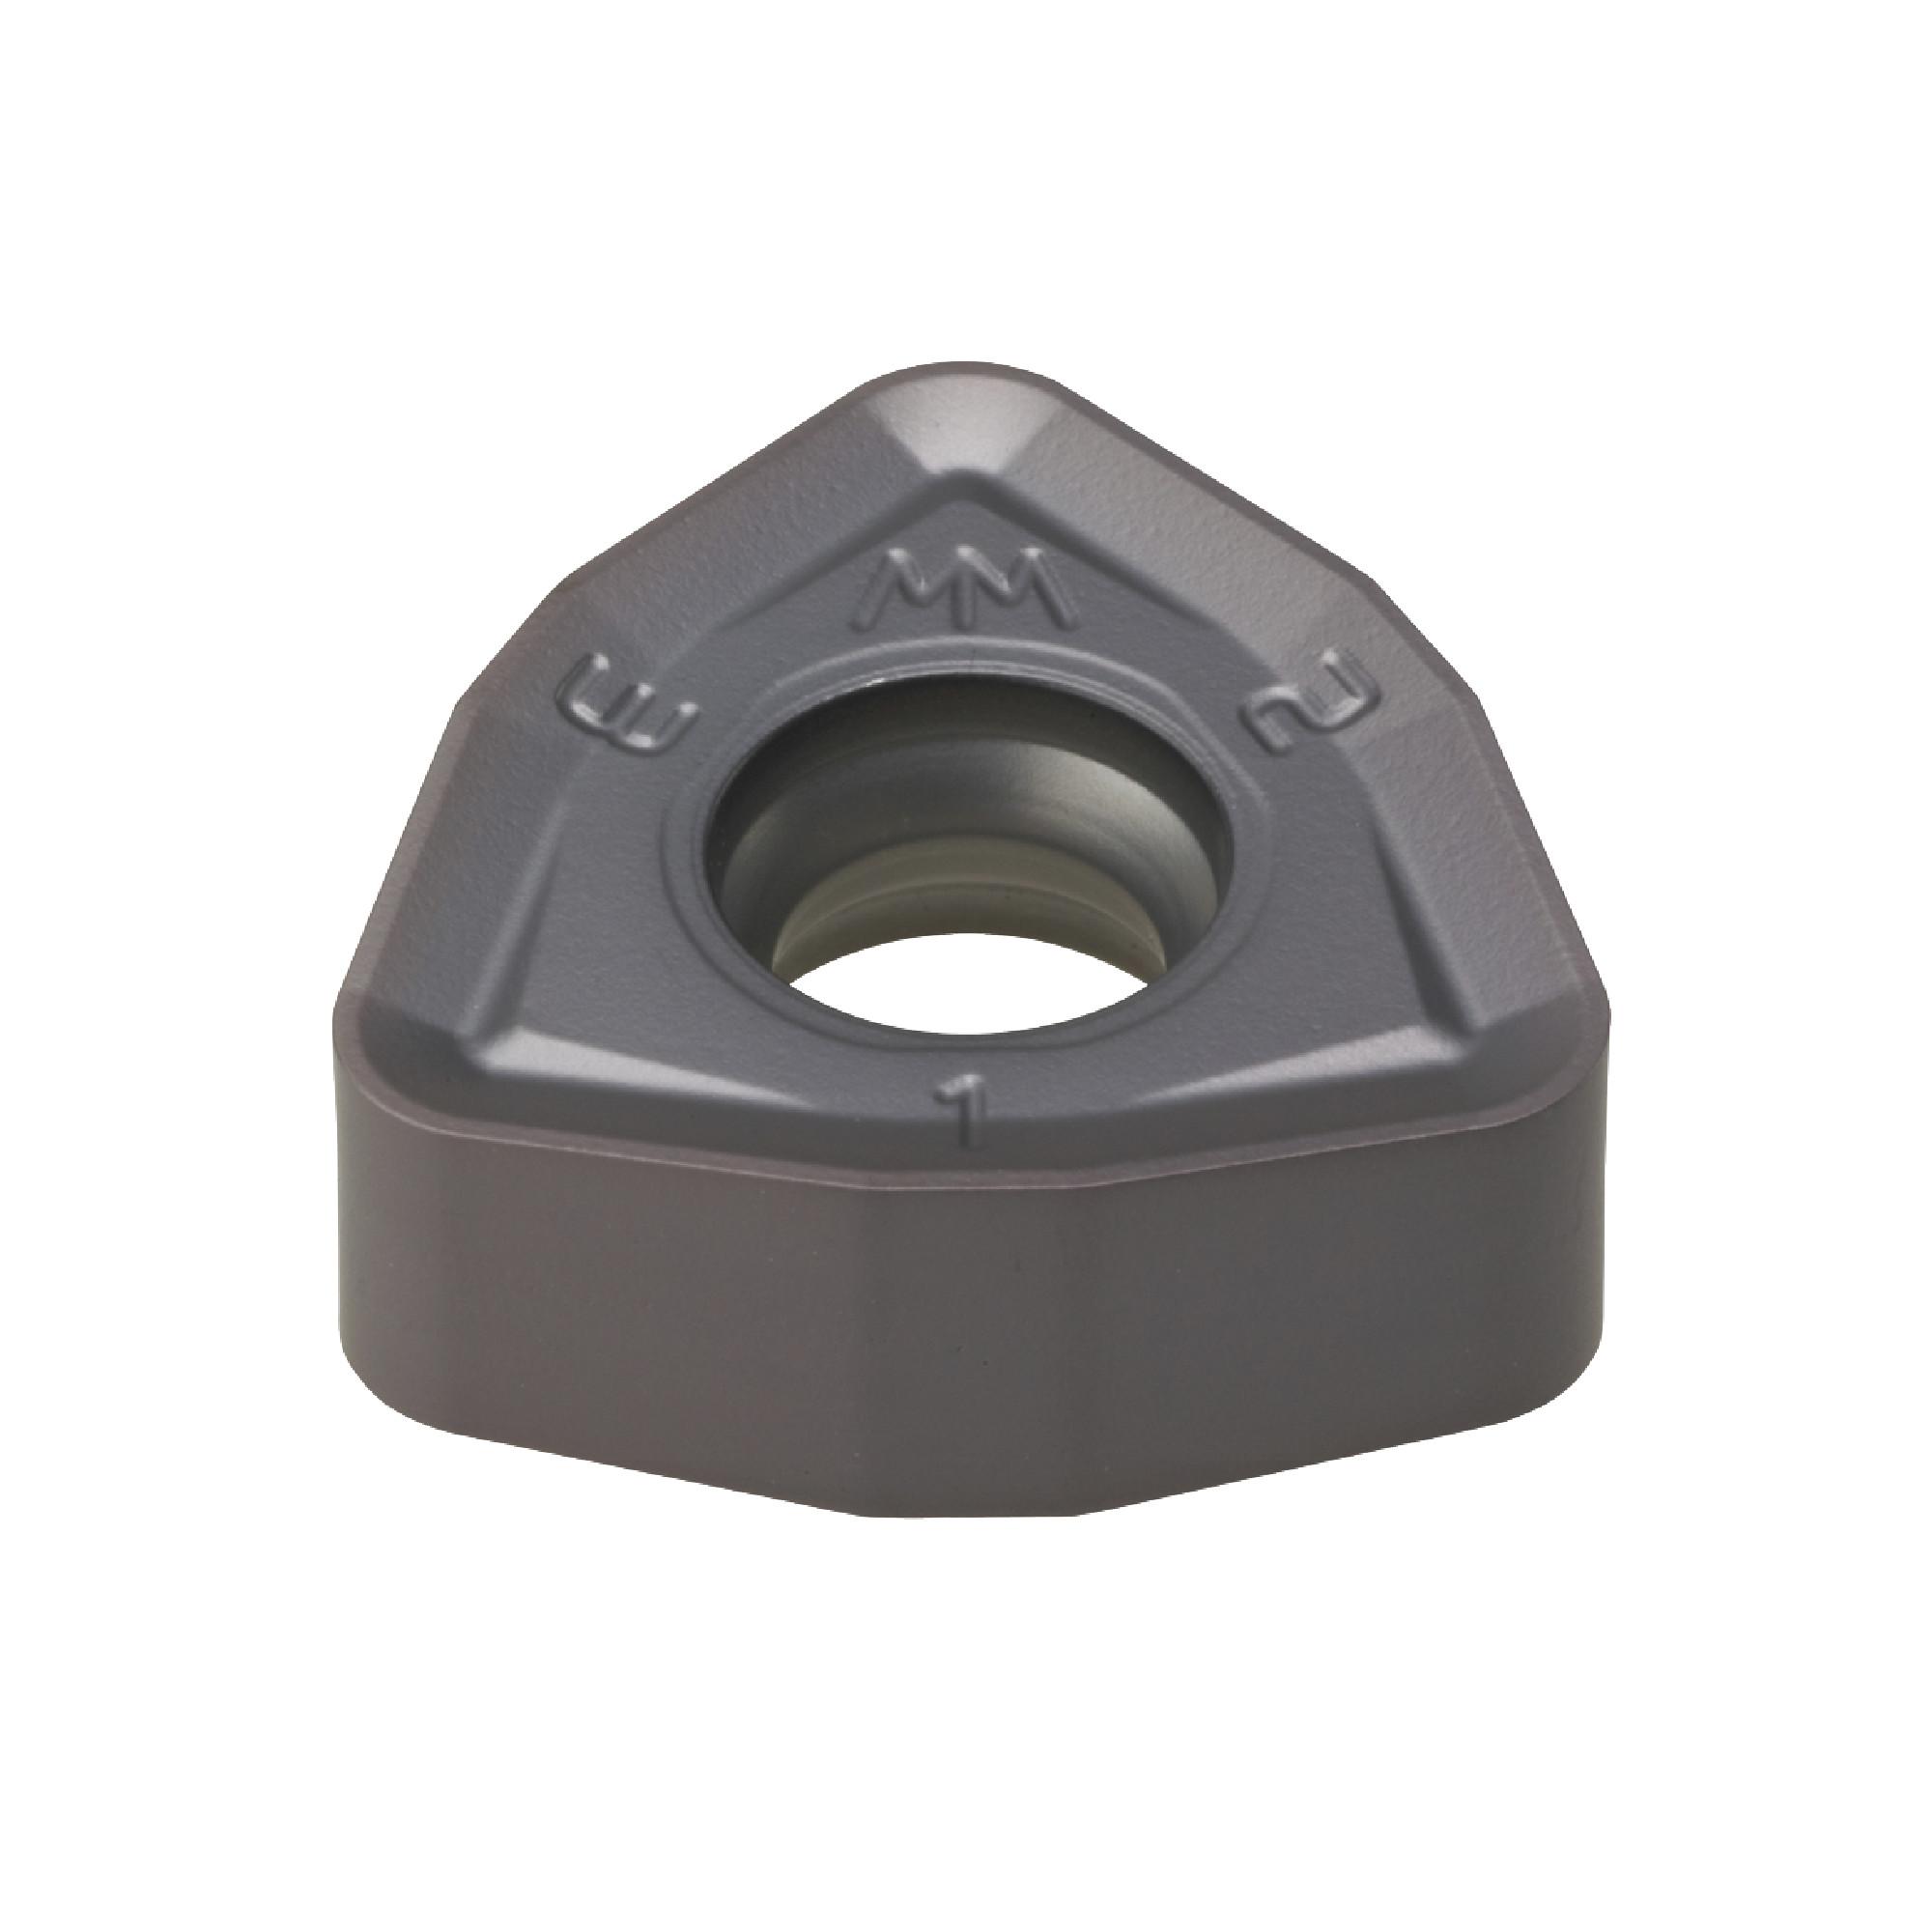 KORLOY - WNMX060312ZNN-MM PC5300 Trigon / INDEXABLE Carbide MILLING INSERT